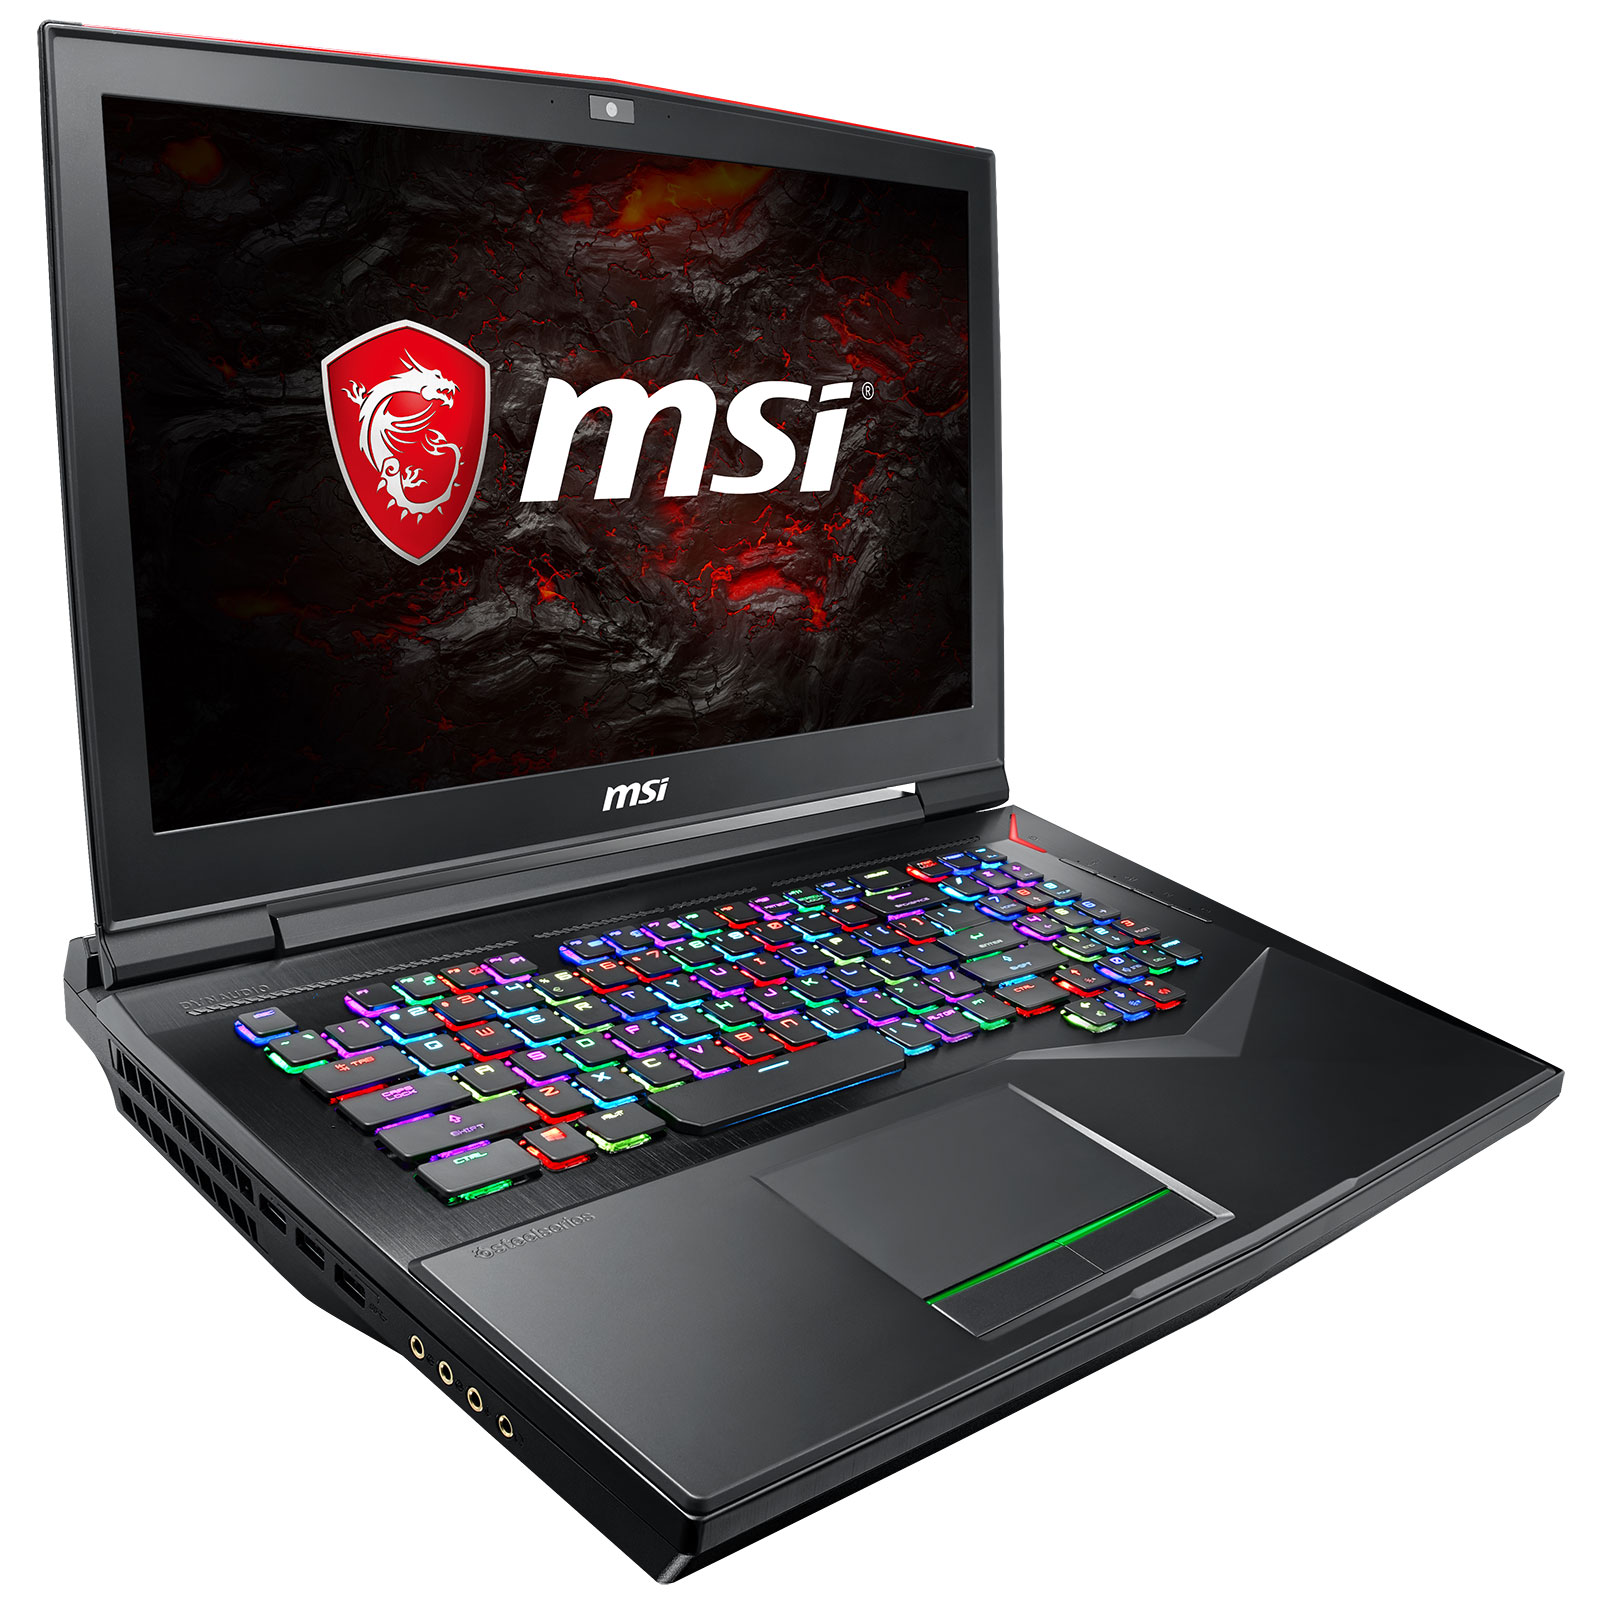 "PC portable MSI GT75 8RG-015FR Titan Intel Core i7-8850H 32 Go SSD 512 Go (2x 256 Go) + HDD 1 To 17.3"" LED Full HD NVIDIA GeForce GTX 1080 8 Go Wi-Fi AC/Bluetooth Webcam Windows 10 Famille 64 bits (garantie constructeur 2 ans)"